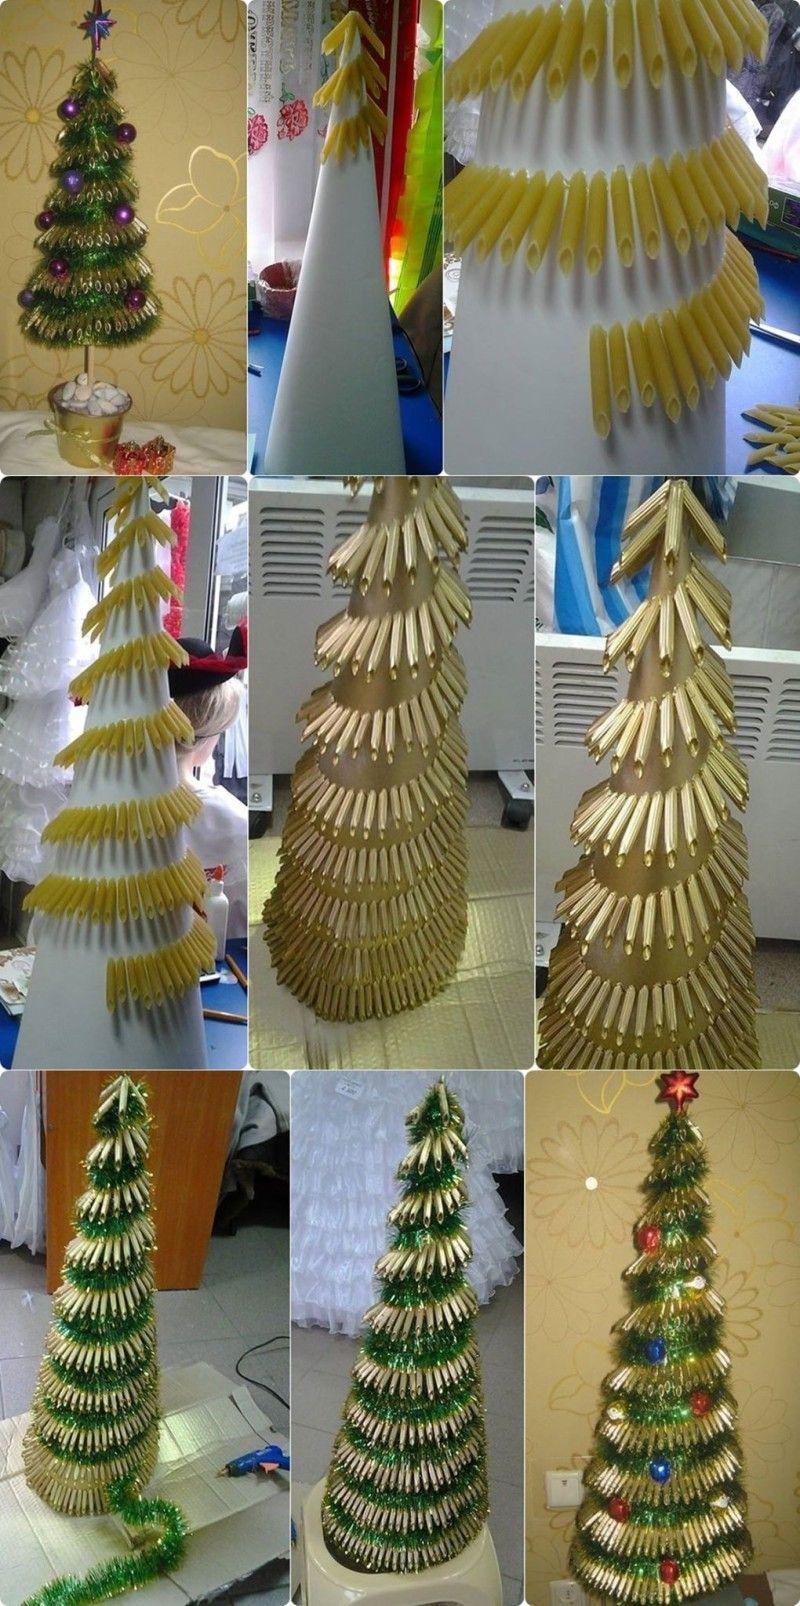 23 Creative And Unusual DIY Christmas Tree Ideas Diy